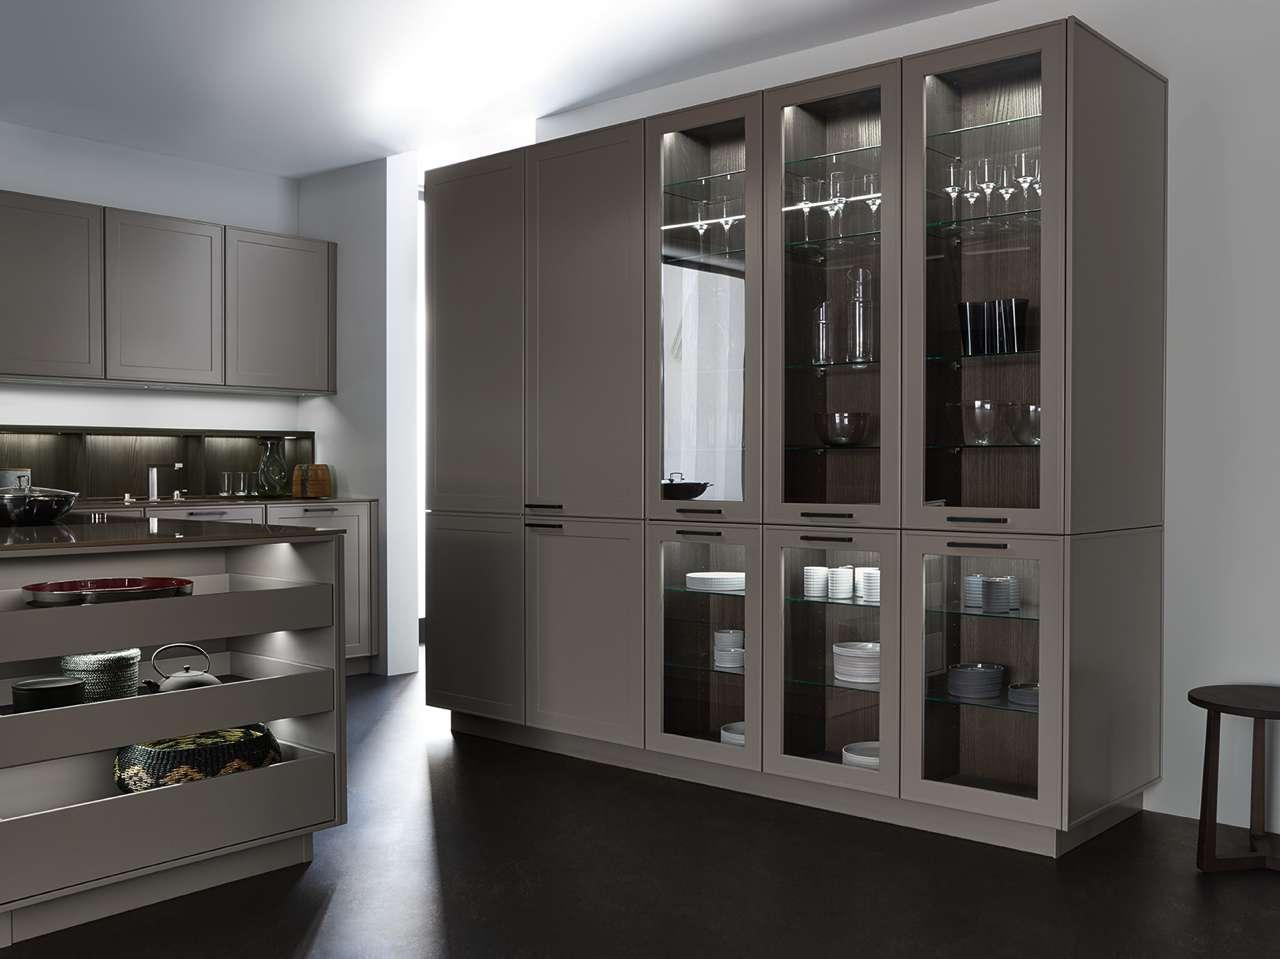 die individualit t des klassischen k chen journal. Black Bedroom Furniture Sets. Home Design Ideas